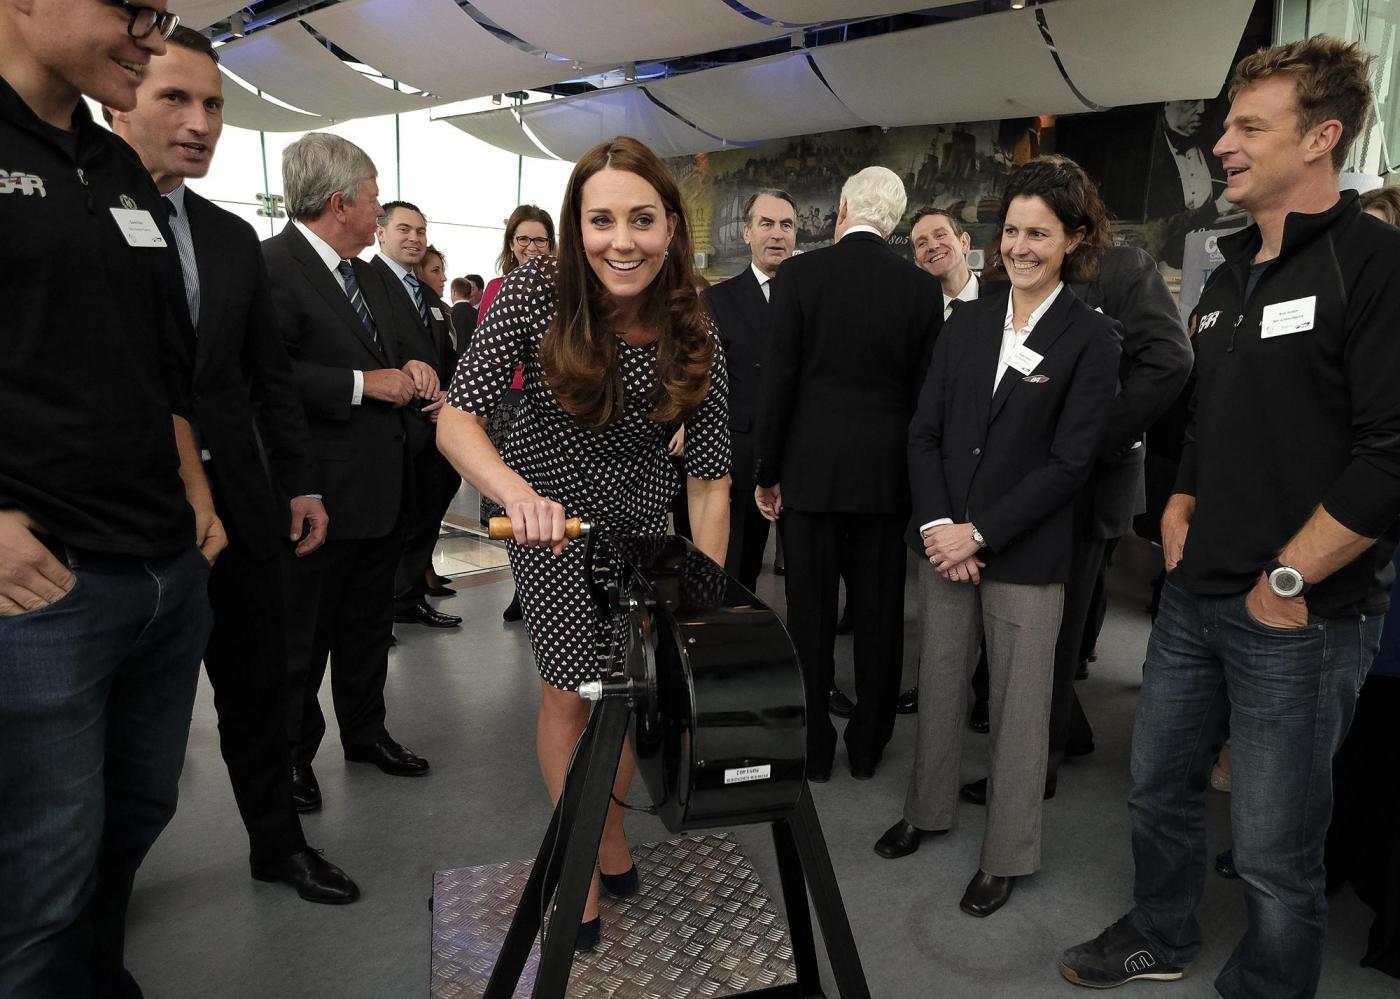 Kate Middleton torna dai Caraibi abbronzata e con un bel pancione 23